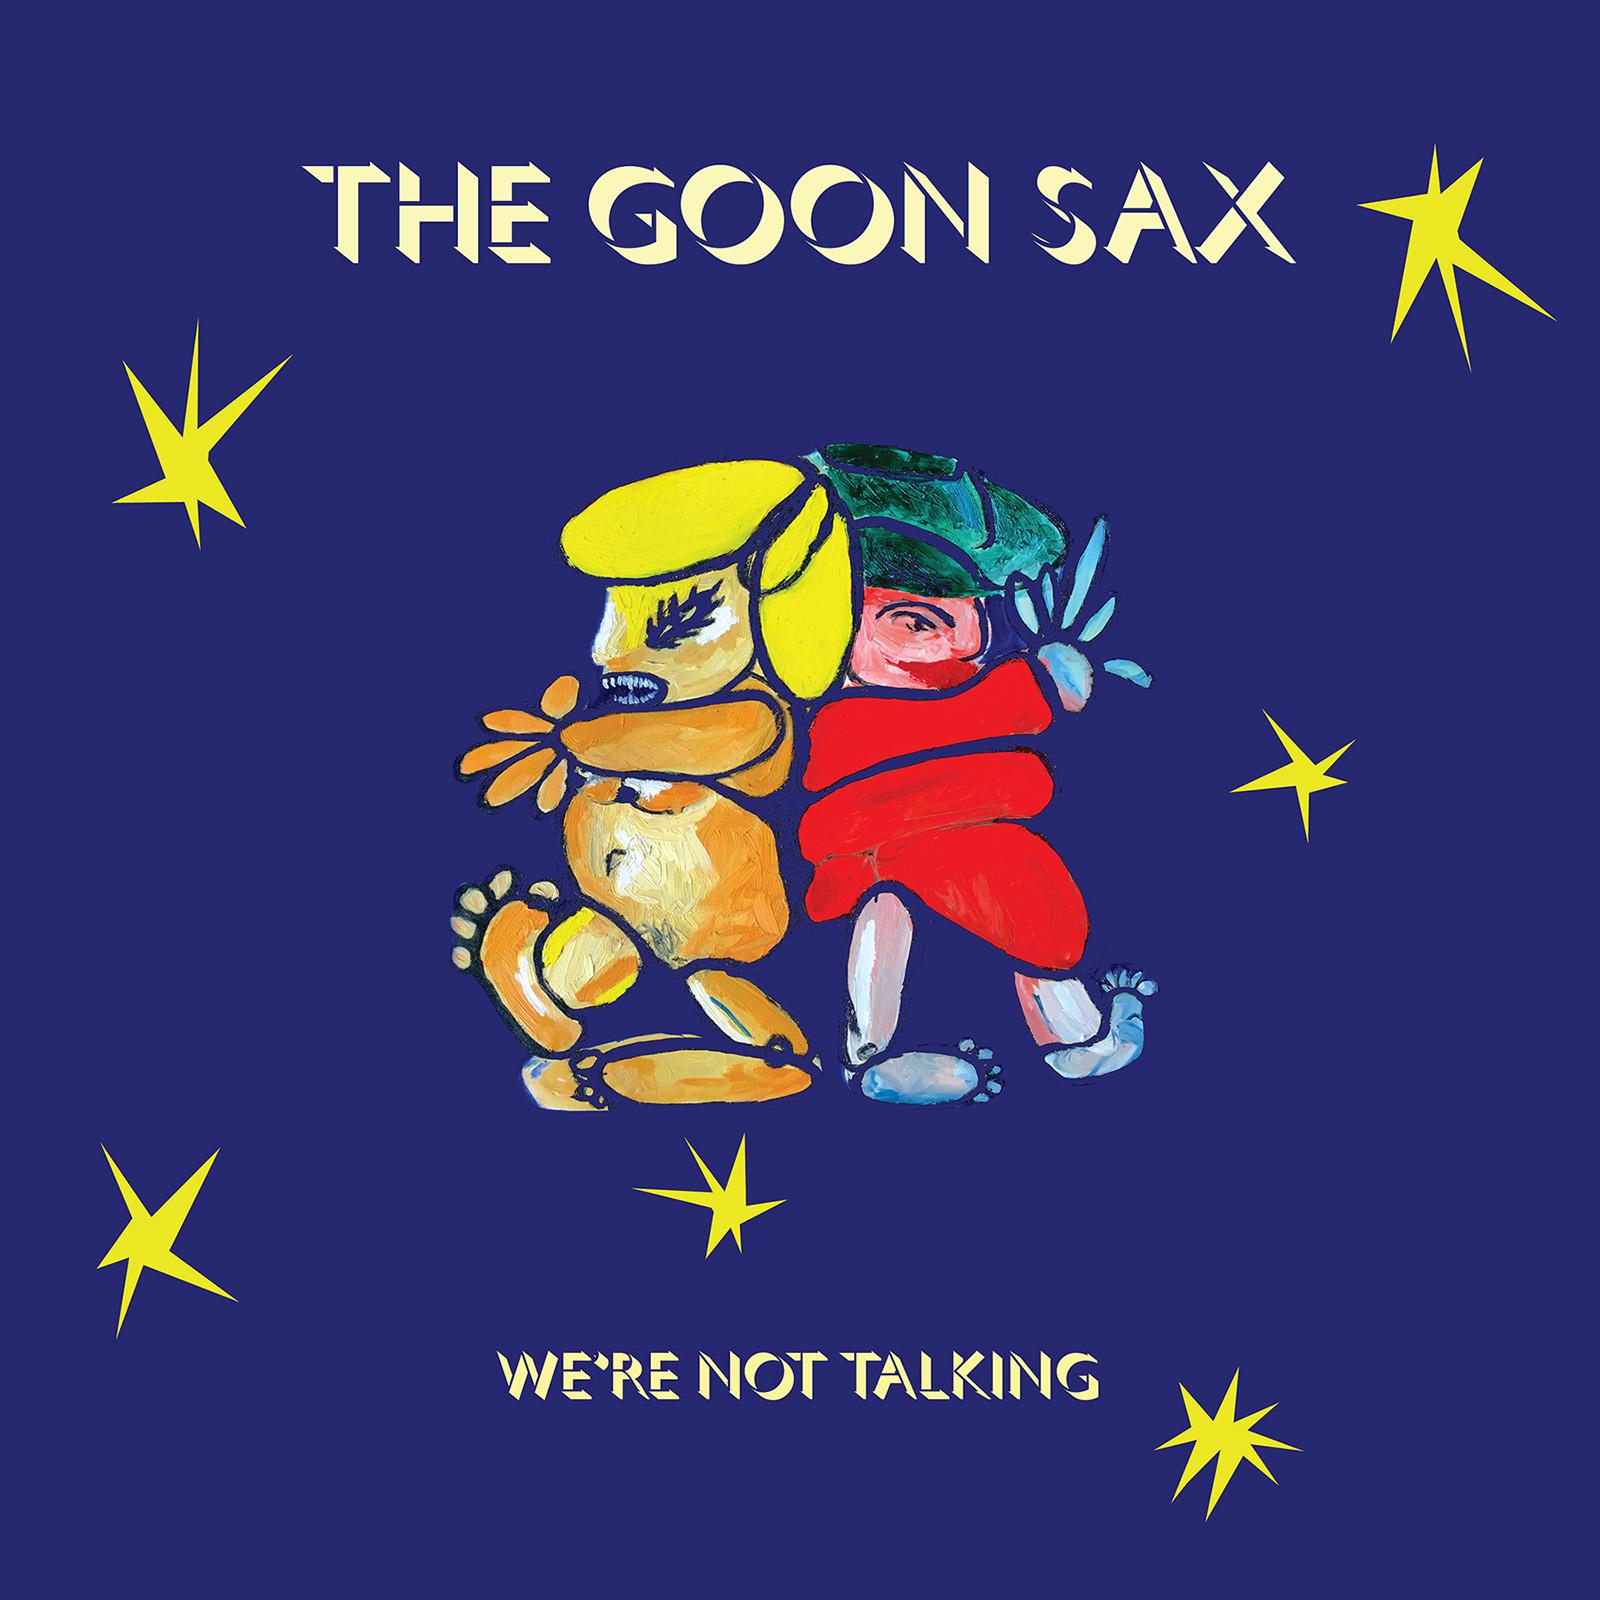 WEBB540LP_GoonSax_Cov1600px.jpg